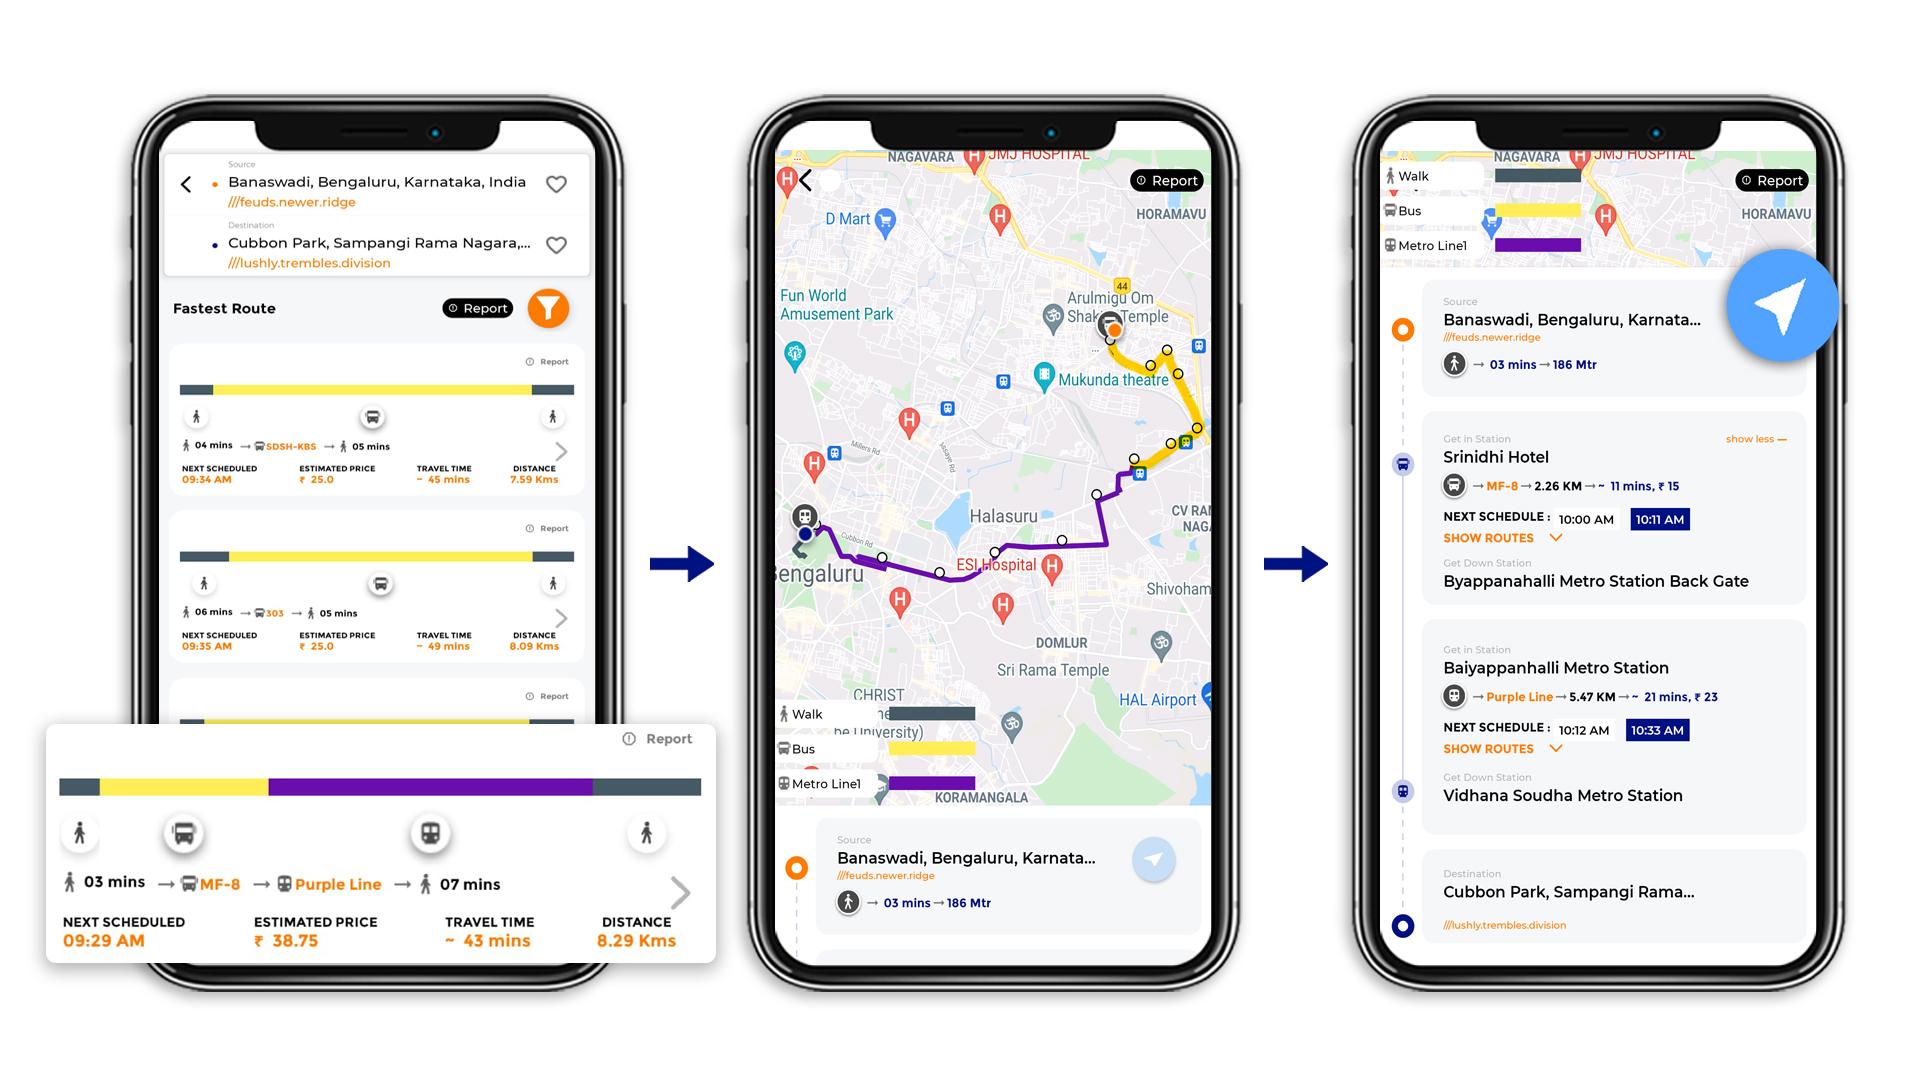 Tummoc, Tummoc app, Public transport information, Banaswadi, Cubbon Park